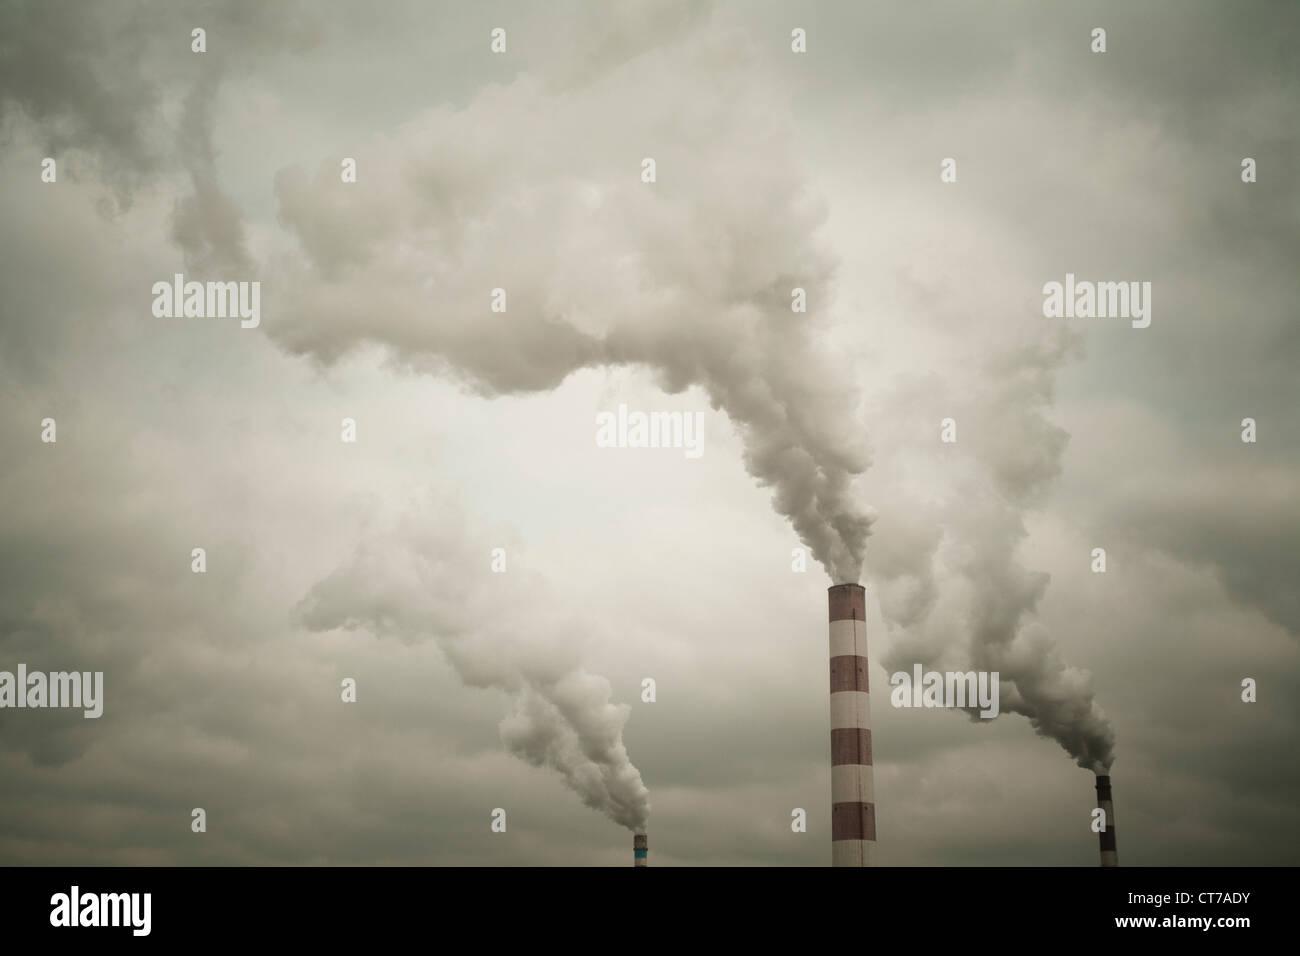 Industrial chimneys smoking - Stock Image